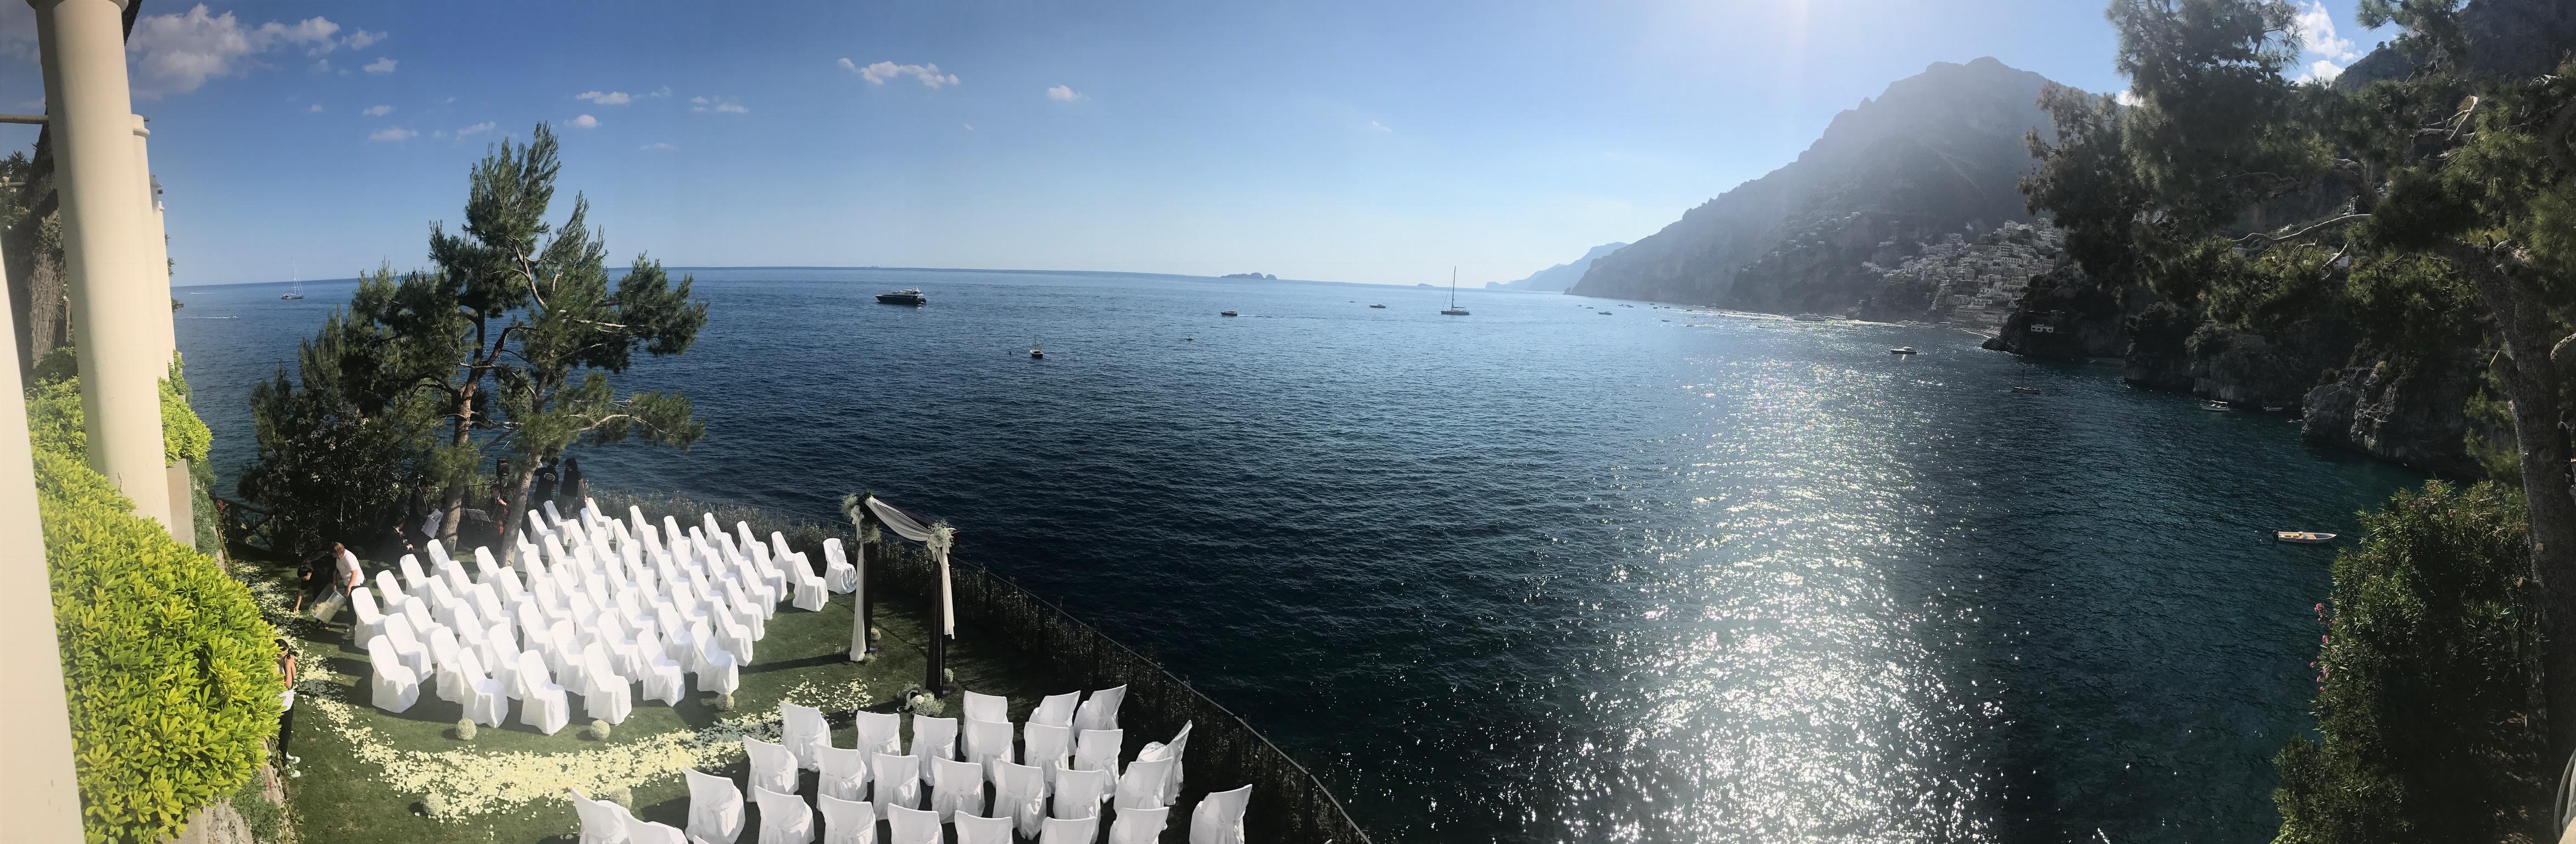 http://www.weddingamalfi.com/wp-content/uploads/Nathalie-and-Benjamin-wedding-in-Positano-1.png